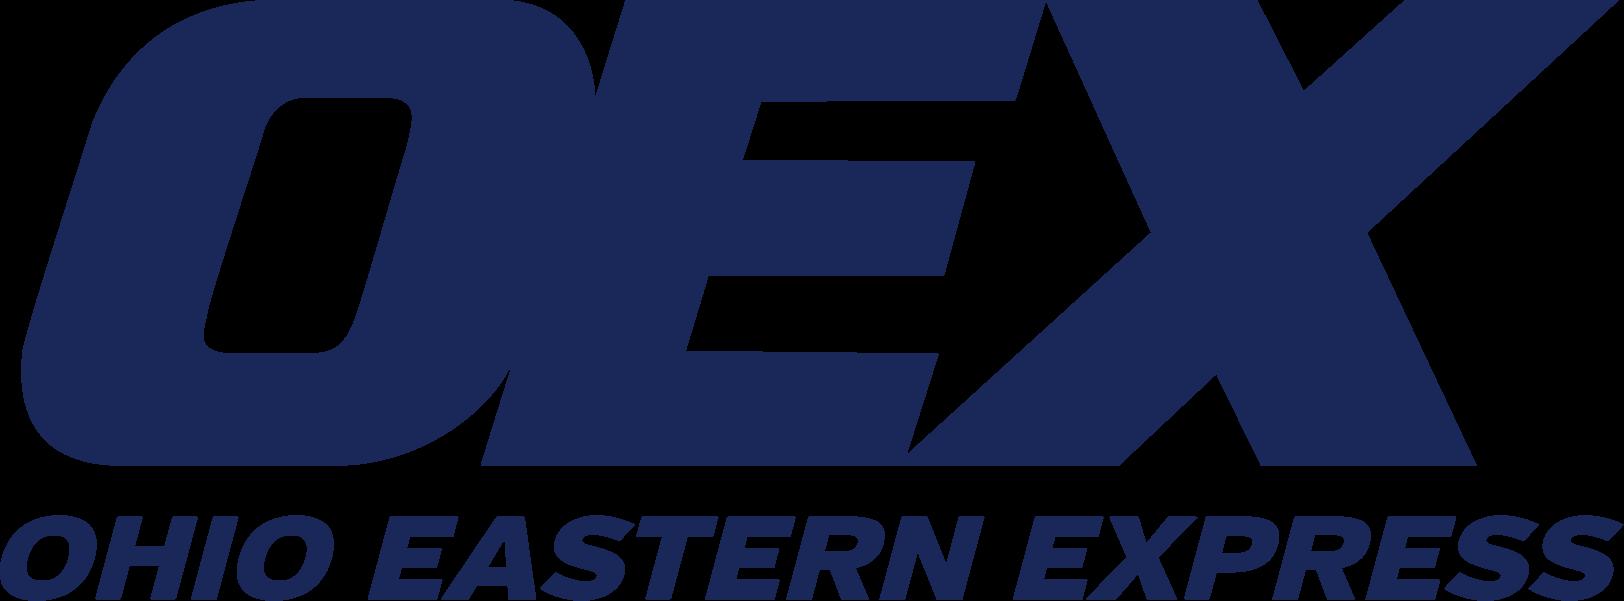 OHIO EASTERN EXPRESS